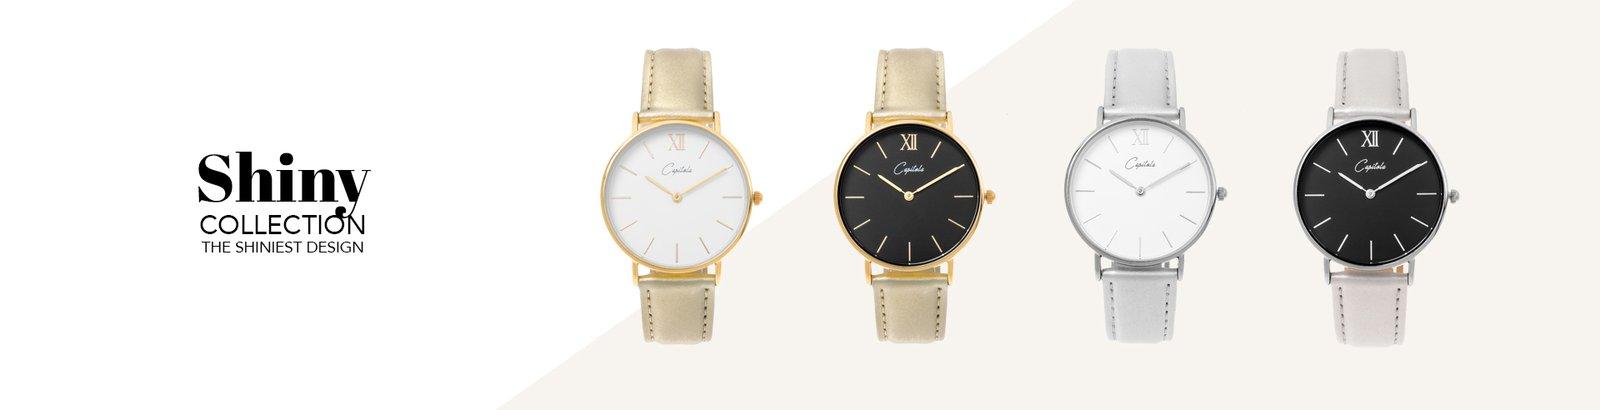 Capitola watches Horloge shiny